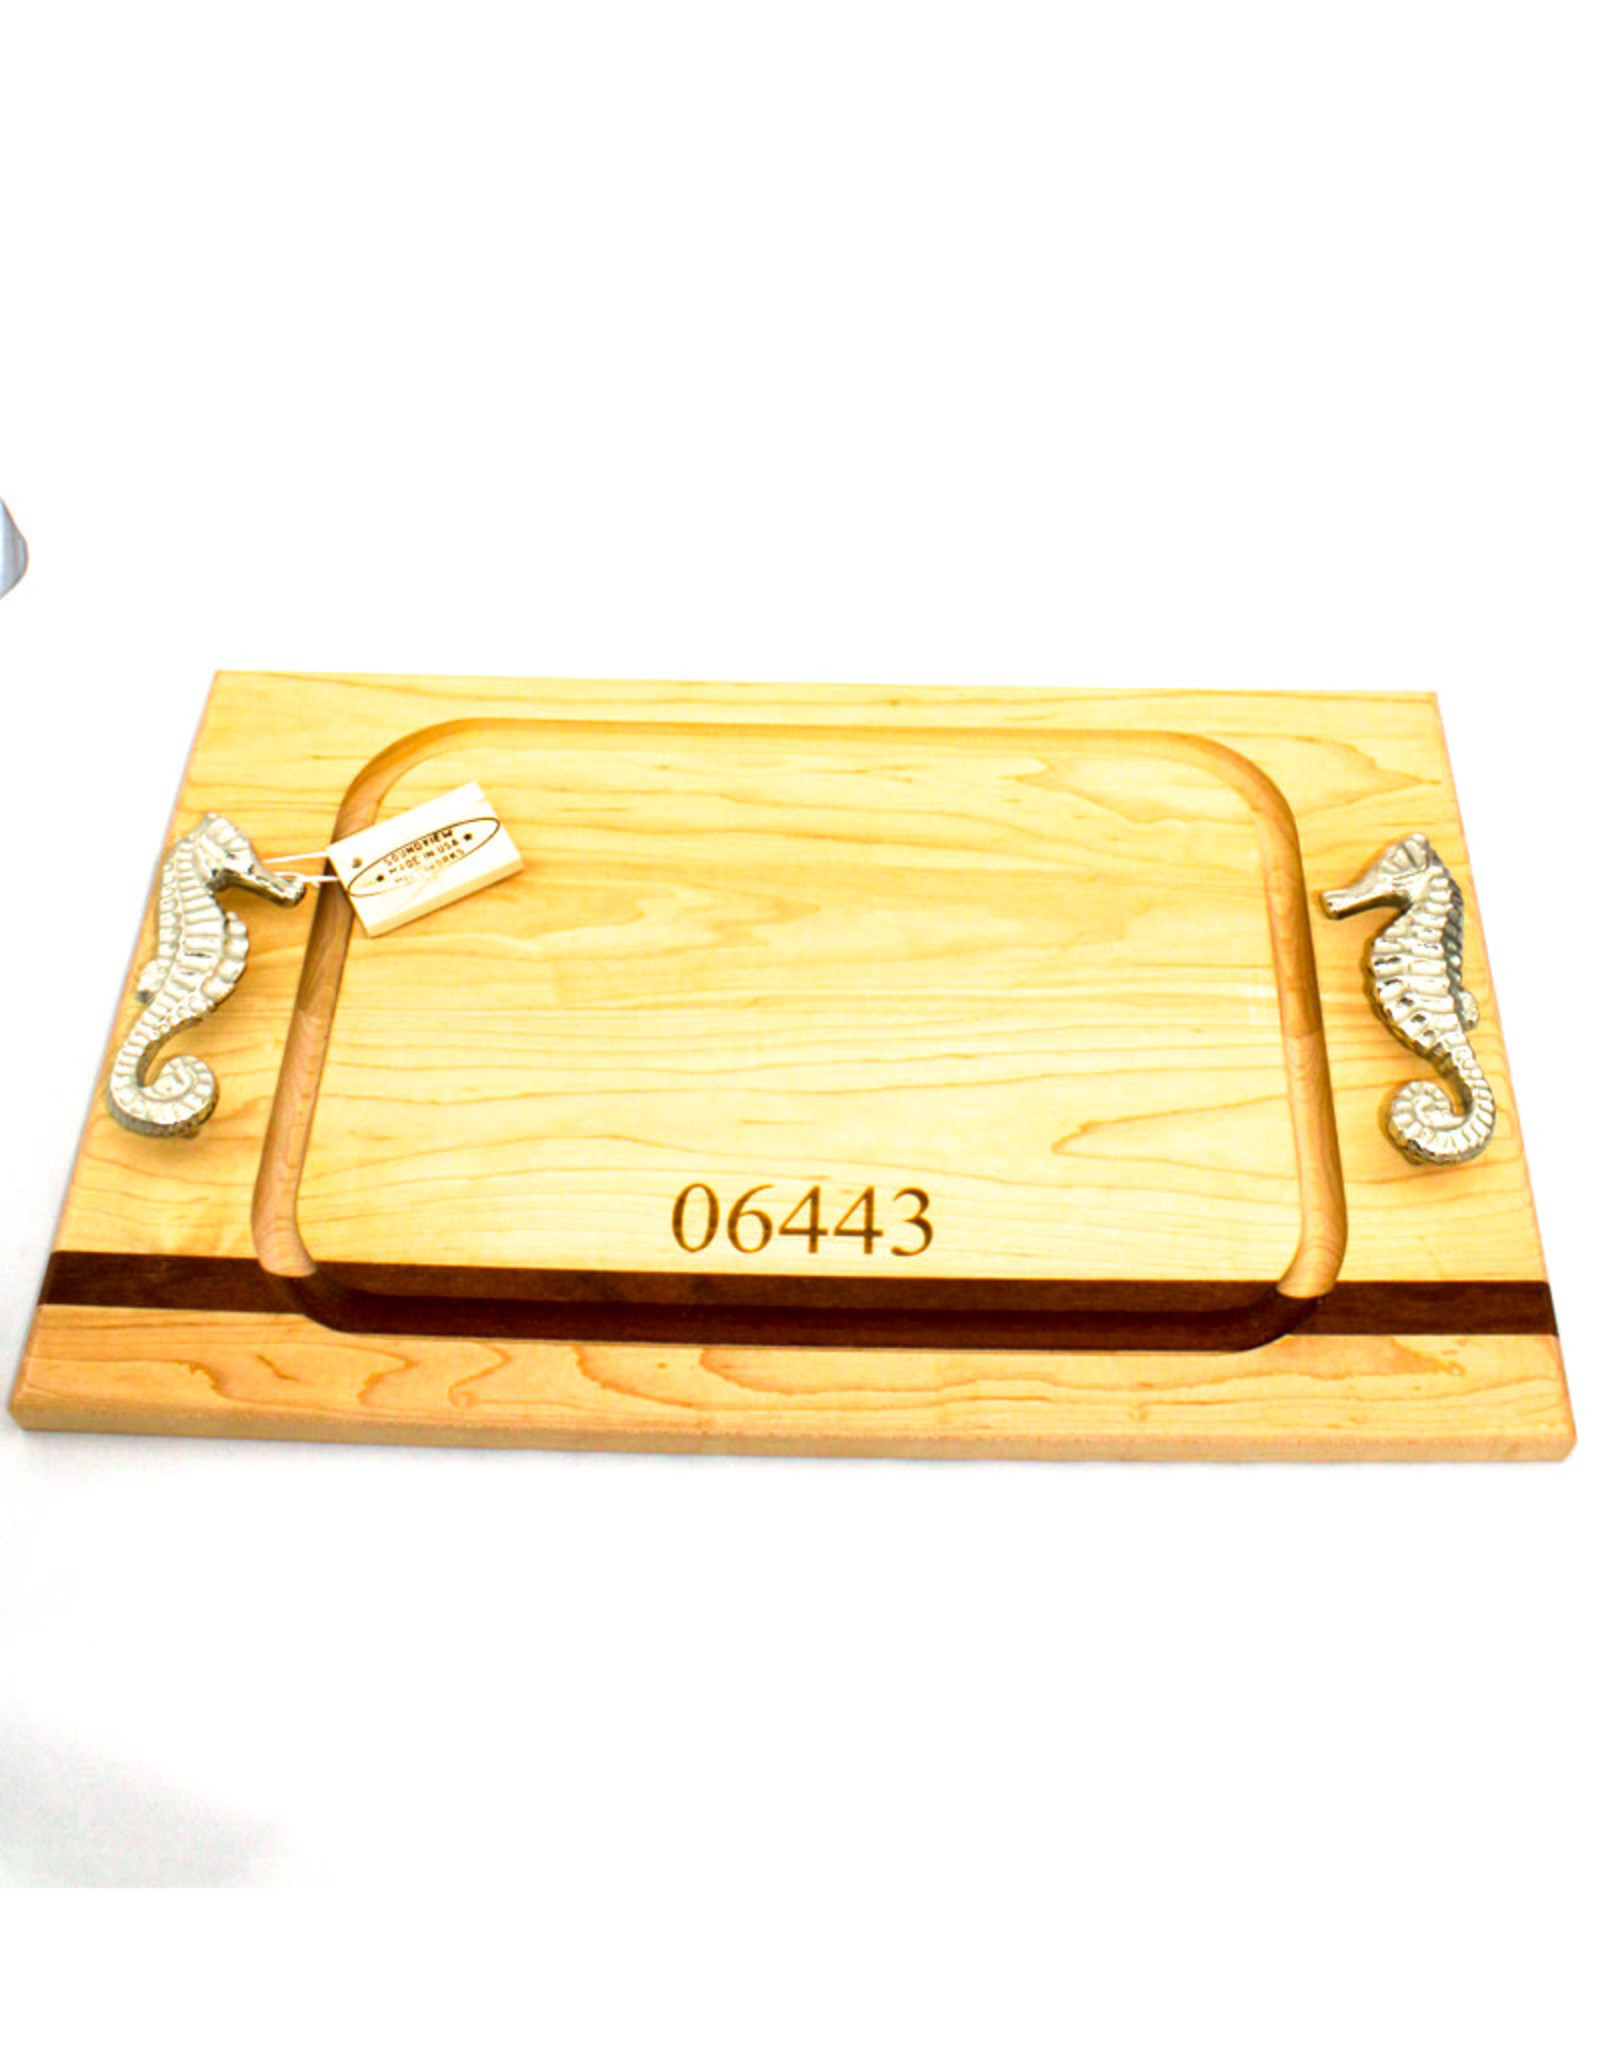 Soundview Millworks Medium Steak Board with 06443 Zip Code-Seahorse Handle